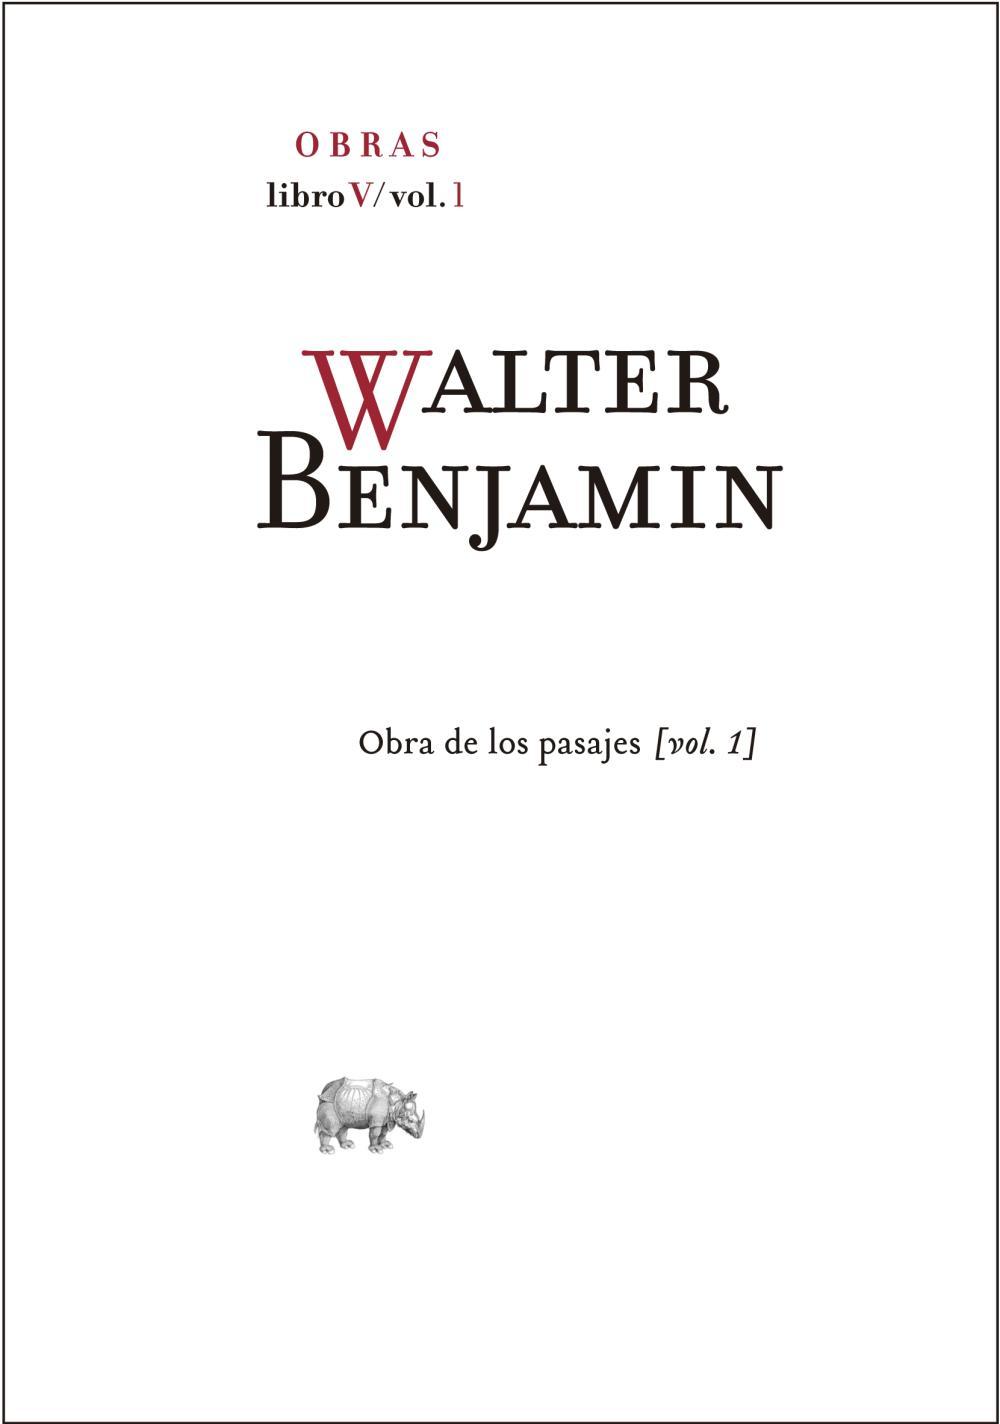 Obra completa. Libro V/vol. 1